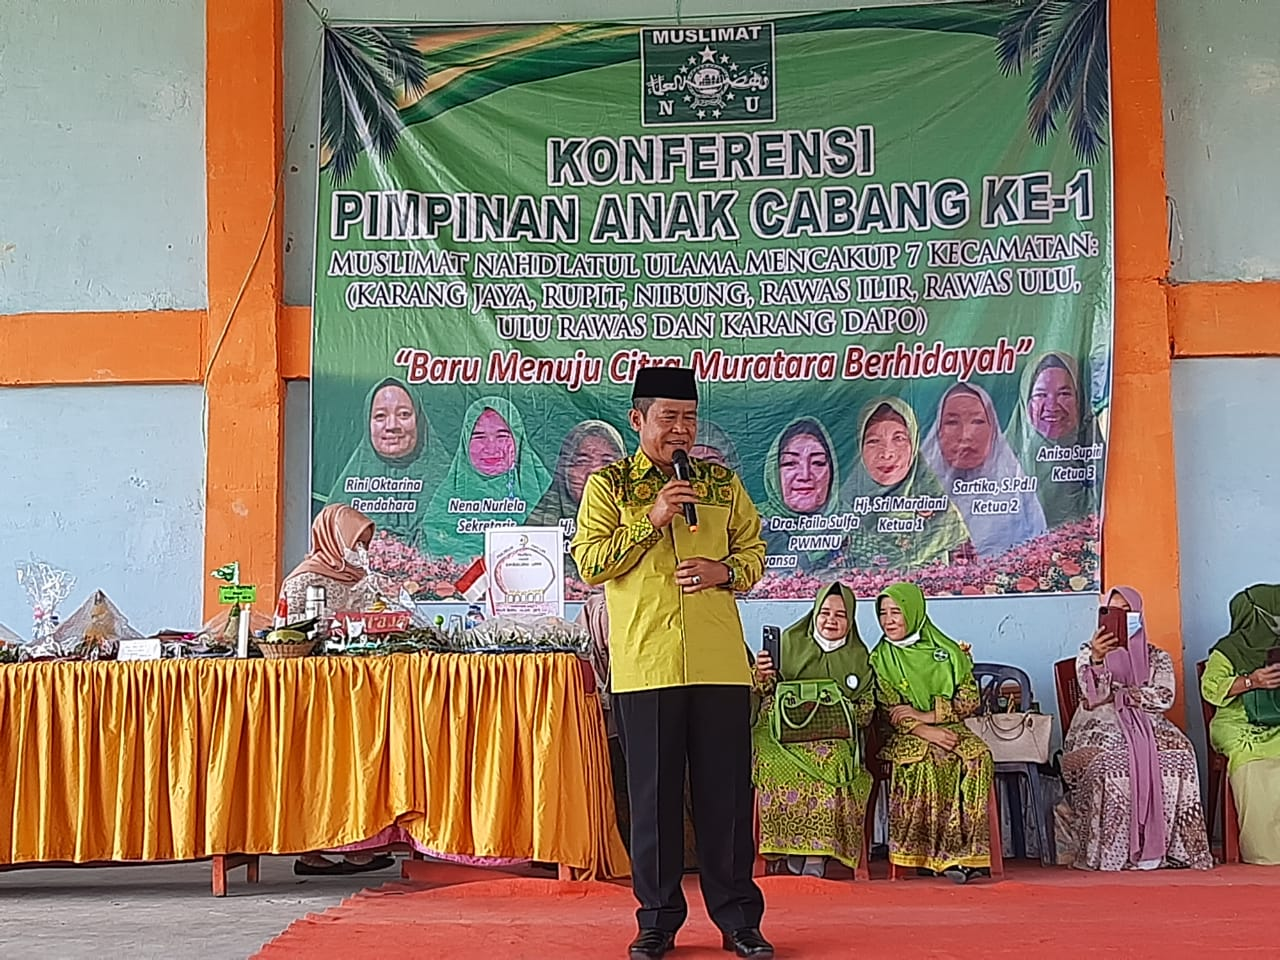 Hadir Pengajian Muslimat NU, Wabup Muratara : NU Benteng NKRI